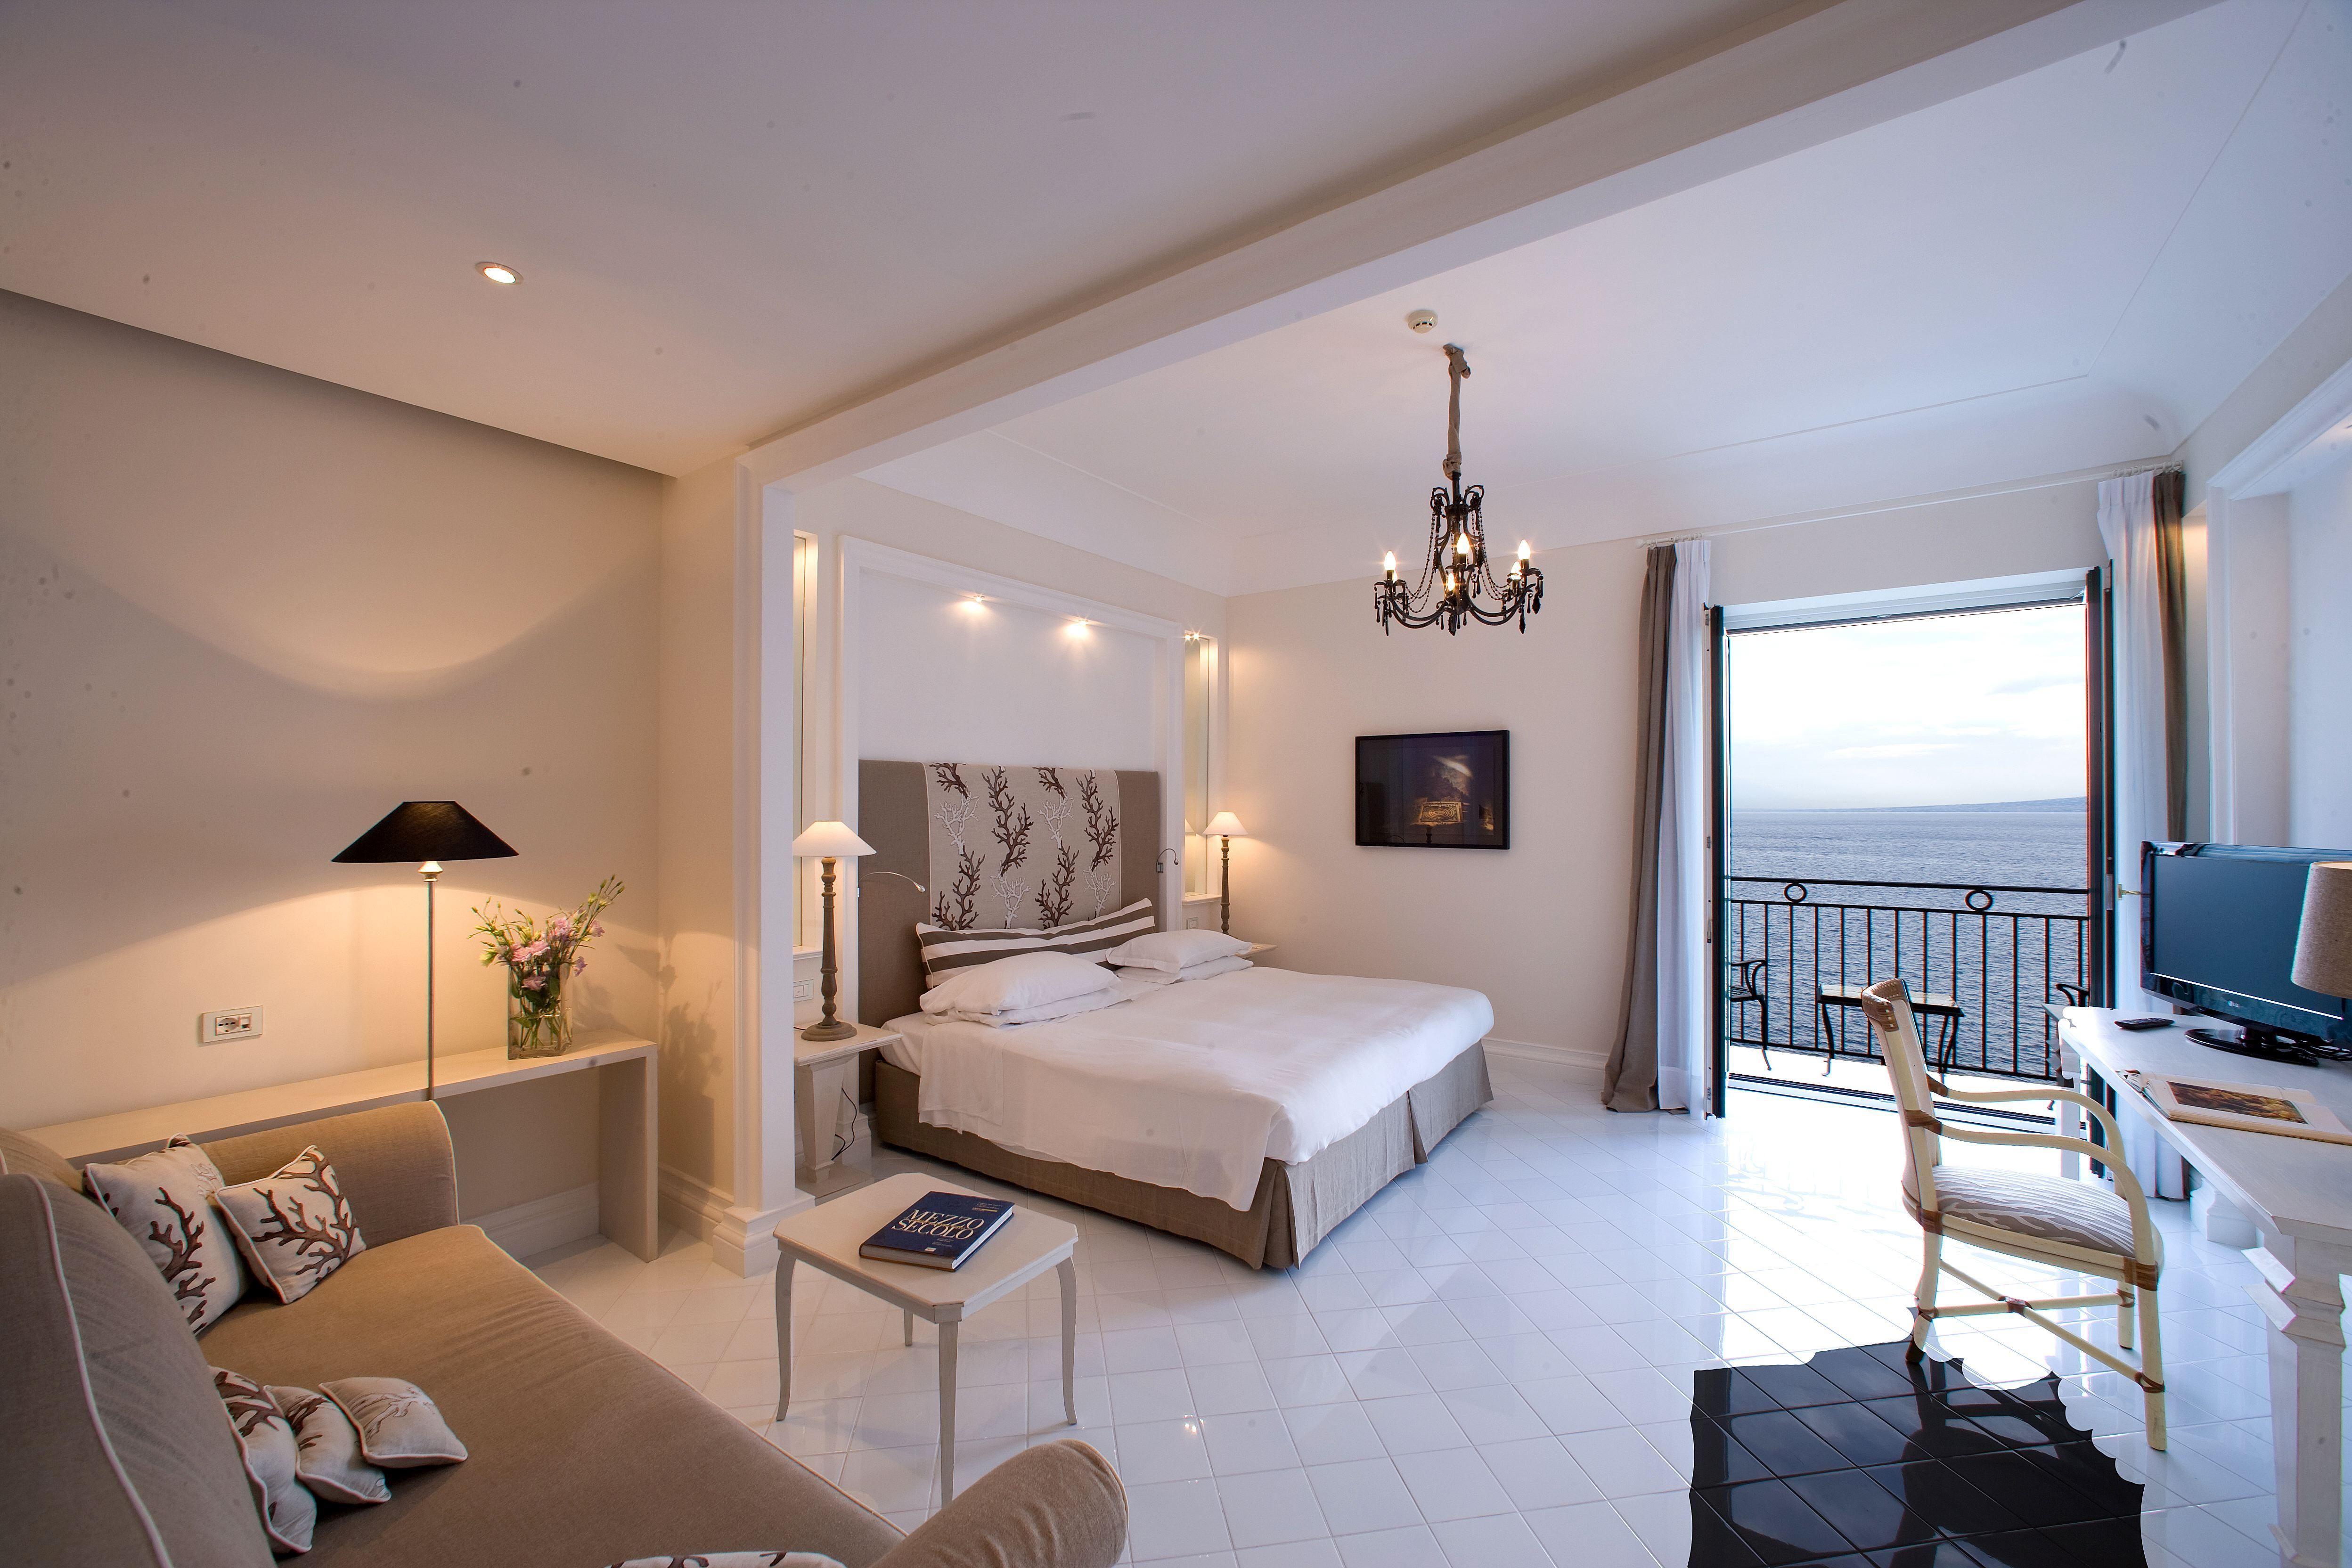 Bellevue Syrene In Sorrento Italy The 21 Luxury Hotel In The  # Muebles Sorento